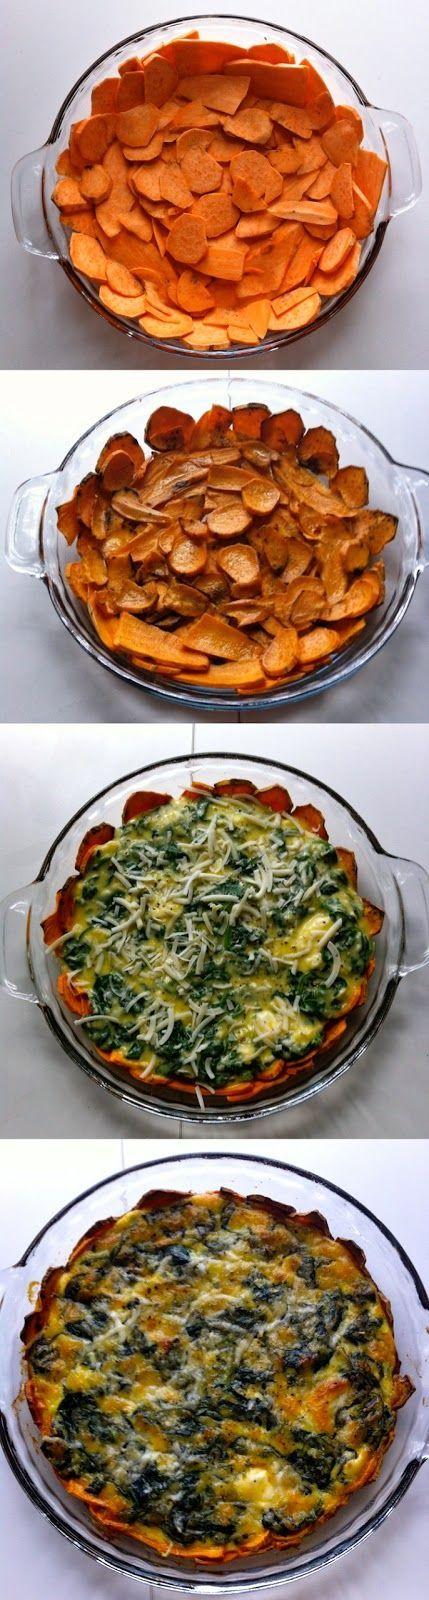 Sweet potato crust cheese quiche | Eat it | Pinterest